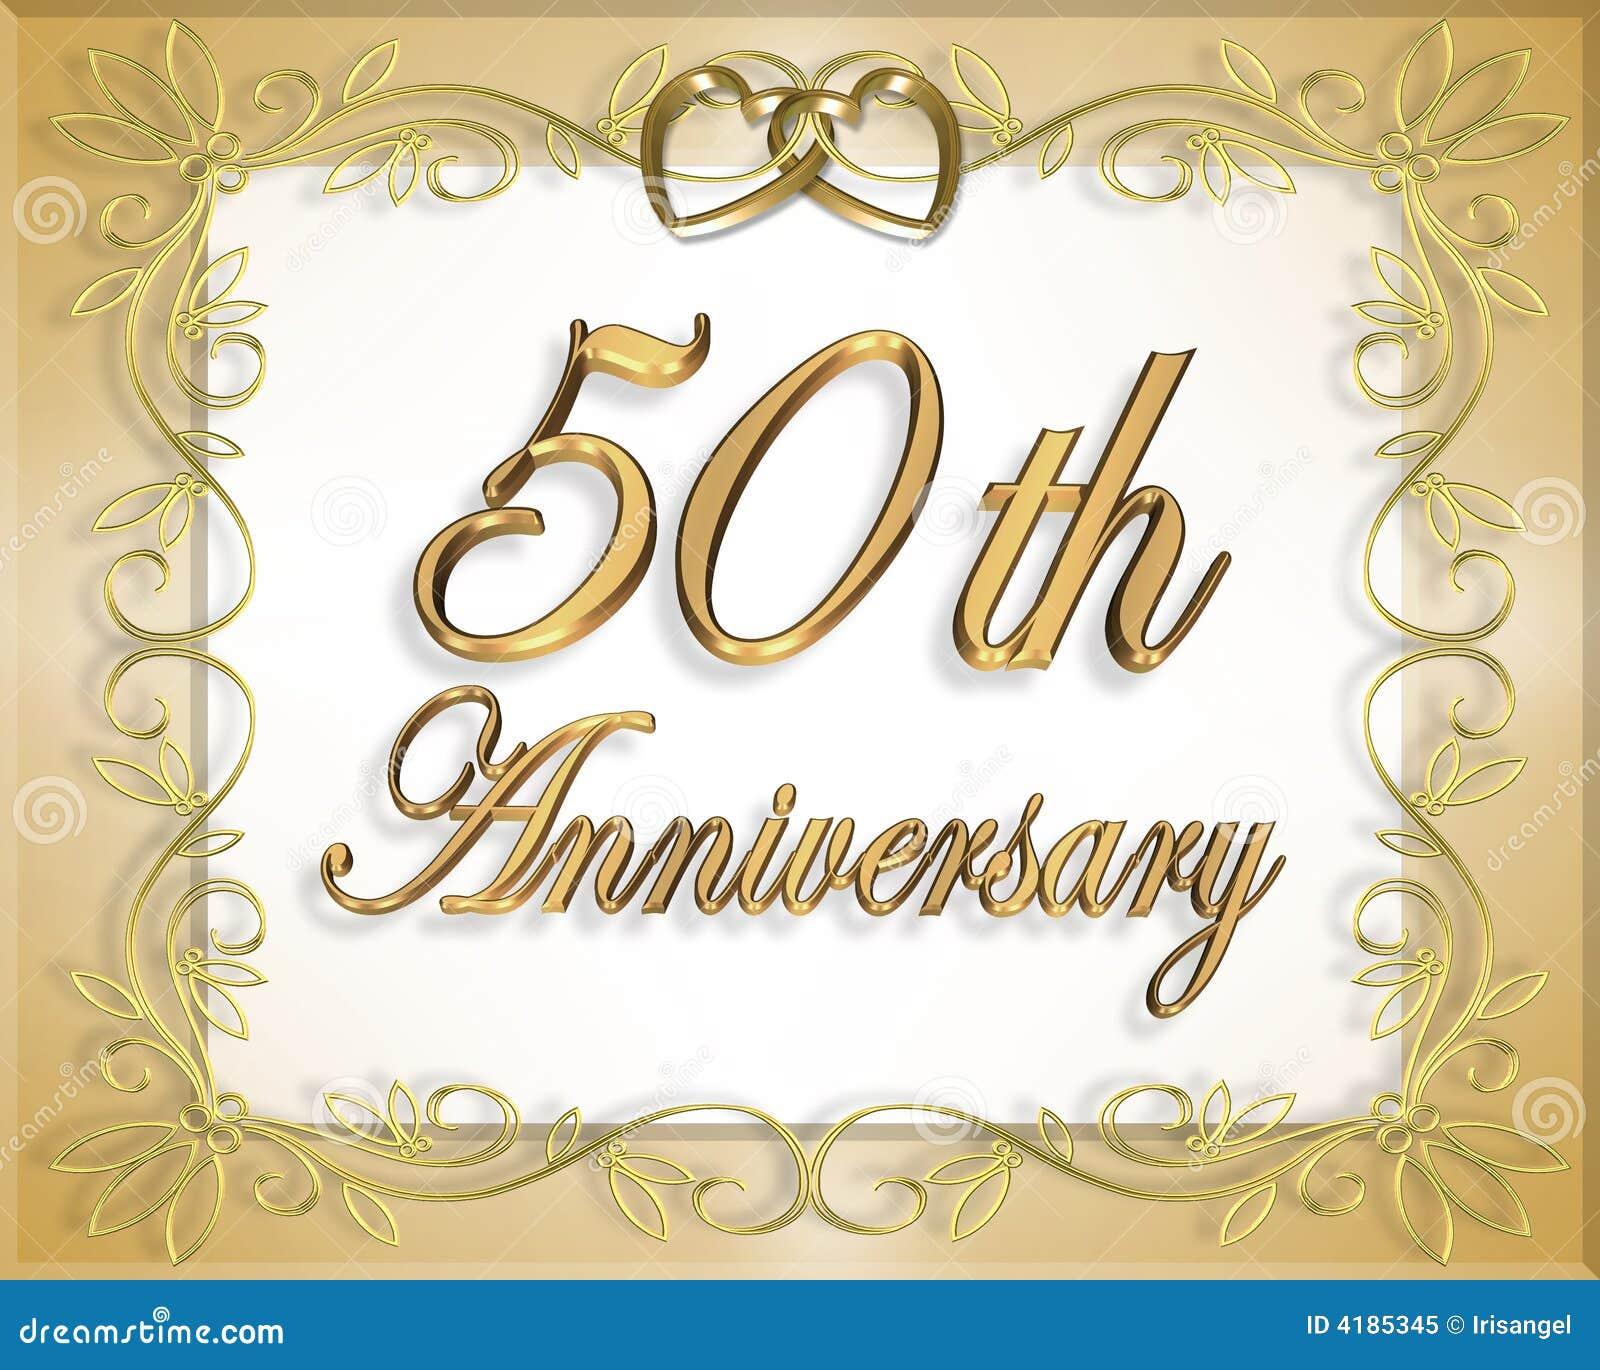 50th wedding anniversary card royalty free stock photo for What is 50th wedding anniversary